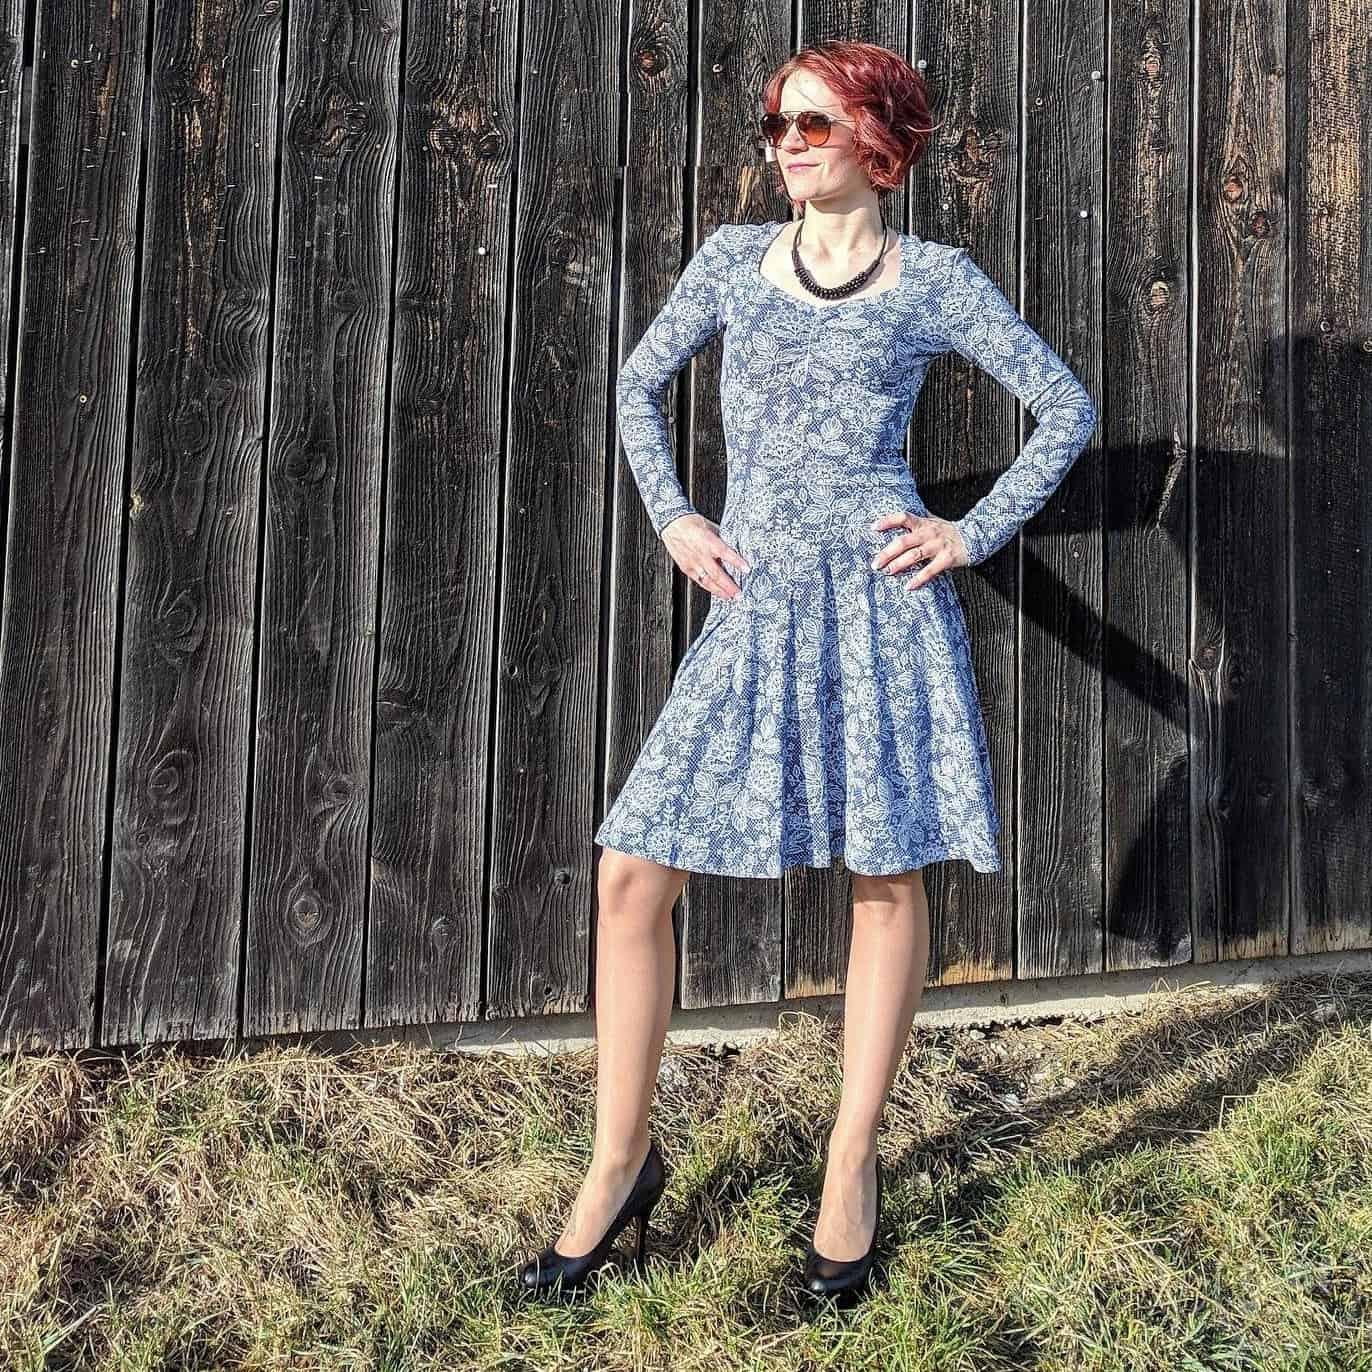 Schnittmuster Kleid Cariba - inkl. Nähanleitung » Textilsucht®